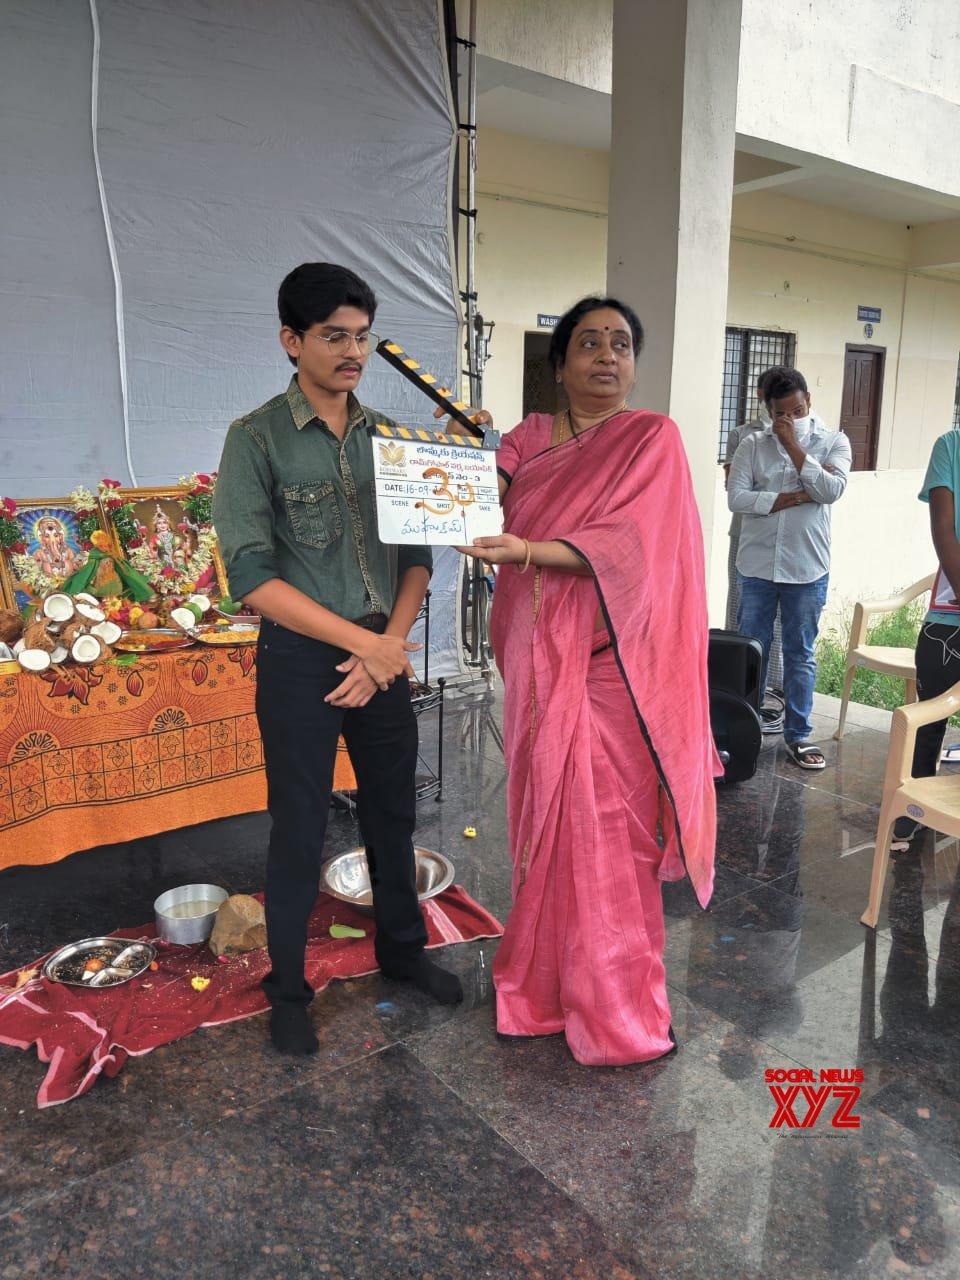 RGV Biopic Part 1, Ramu - A Biopic Of Ram Gopal Varma Movie Shooting Started